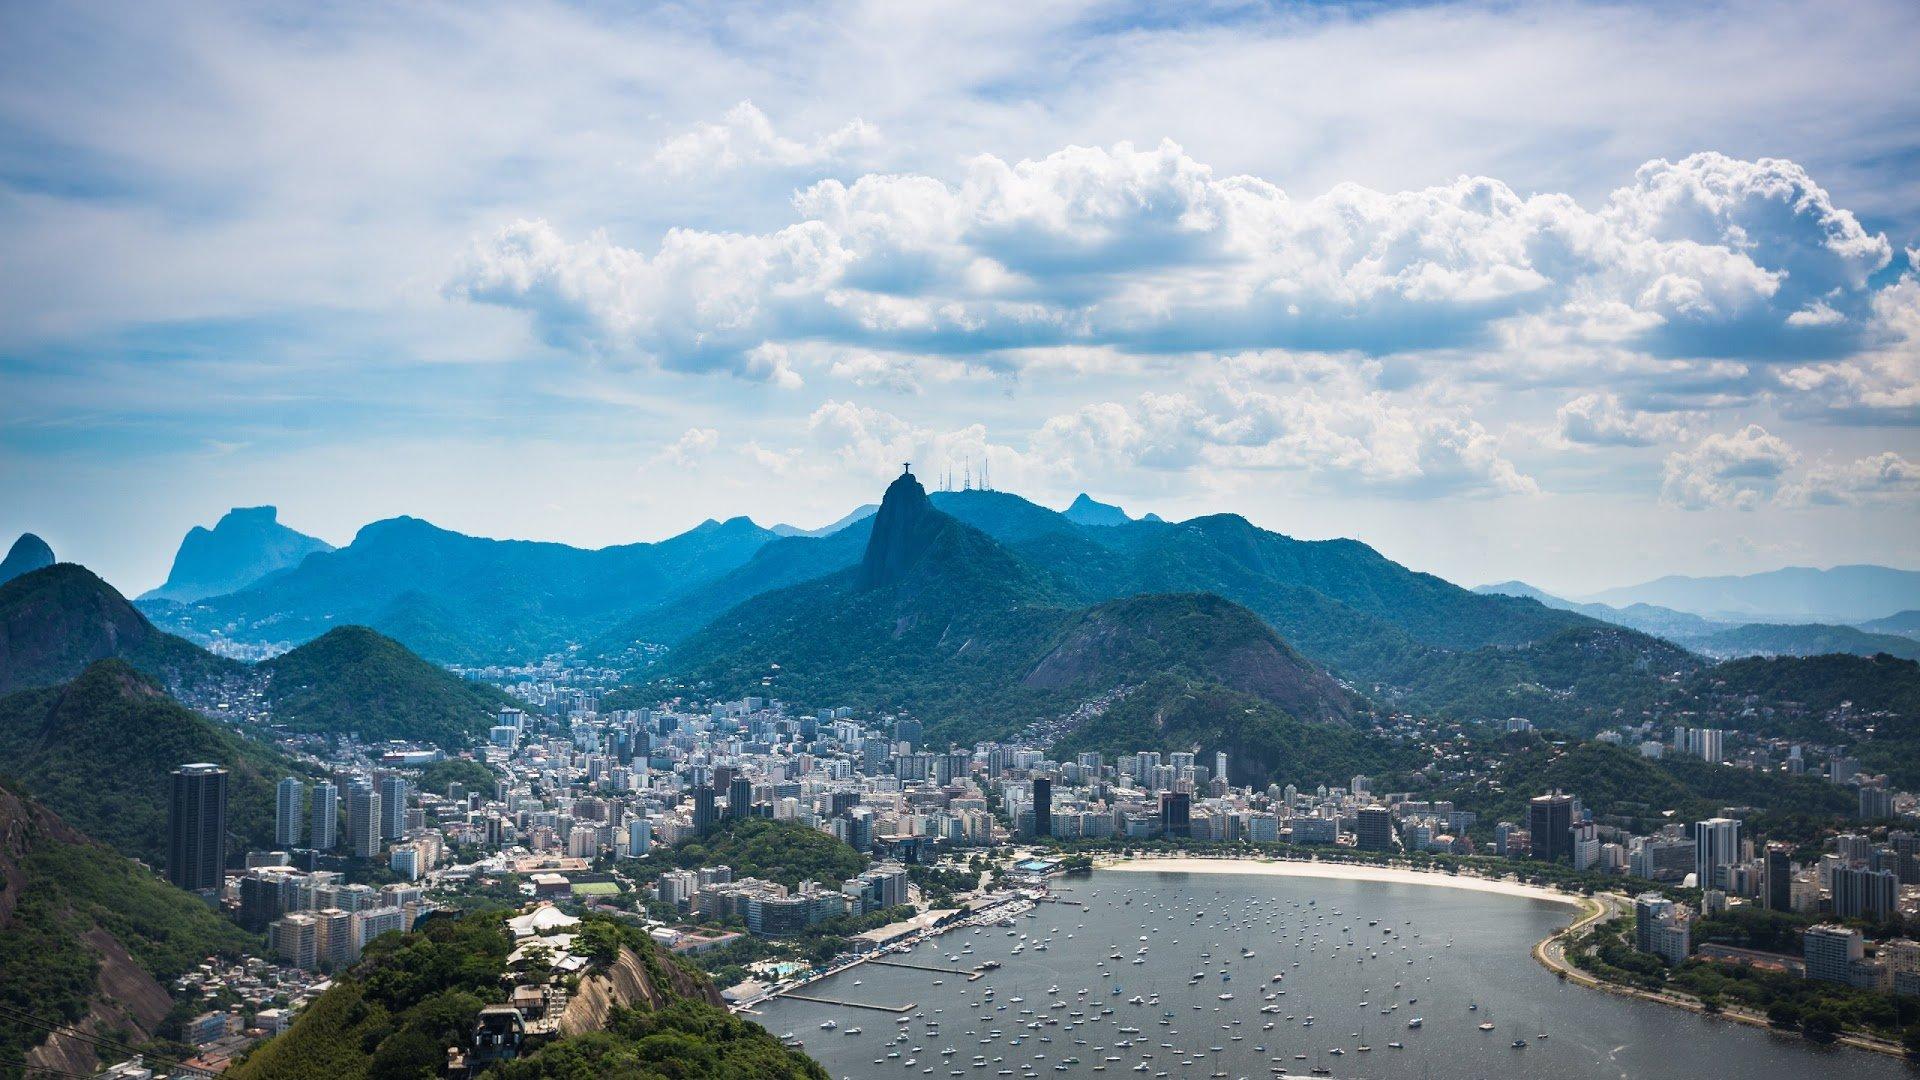 Rio de Janeiro Brazil Wallpaper 183 HD Wallpapers 1920x1080